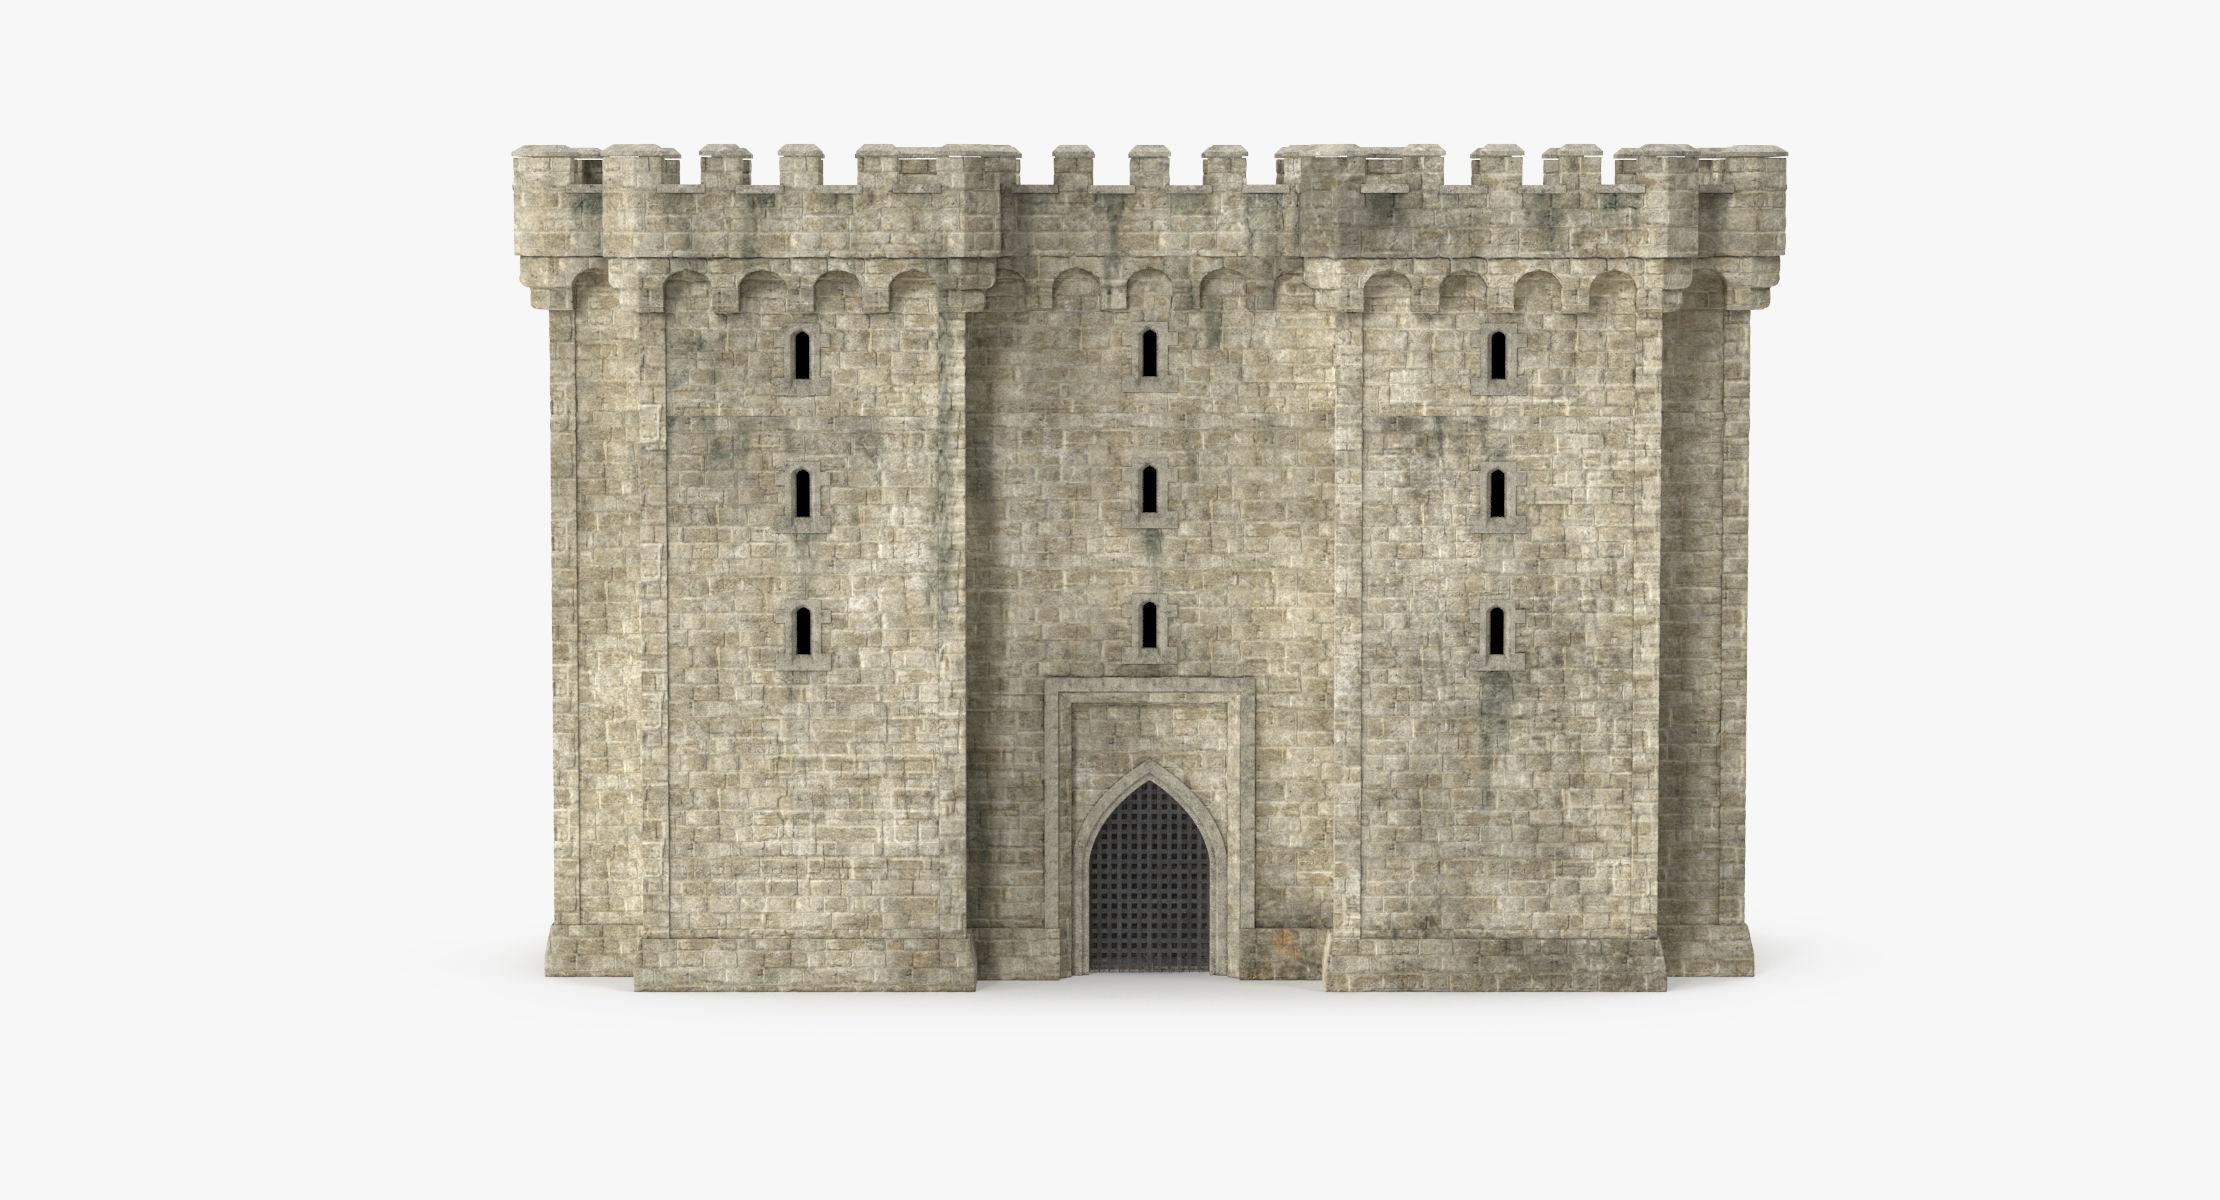 Gatehouse with portcullis 02 - reel 1